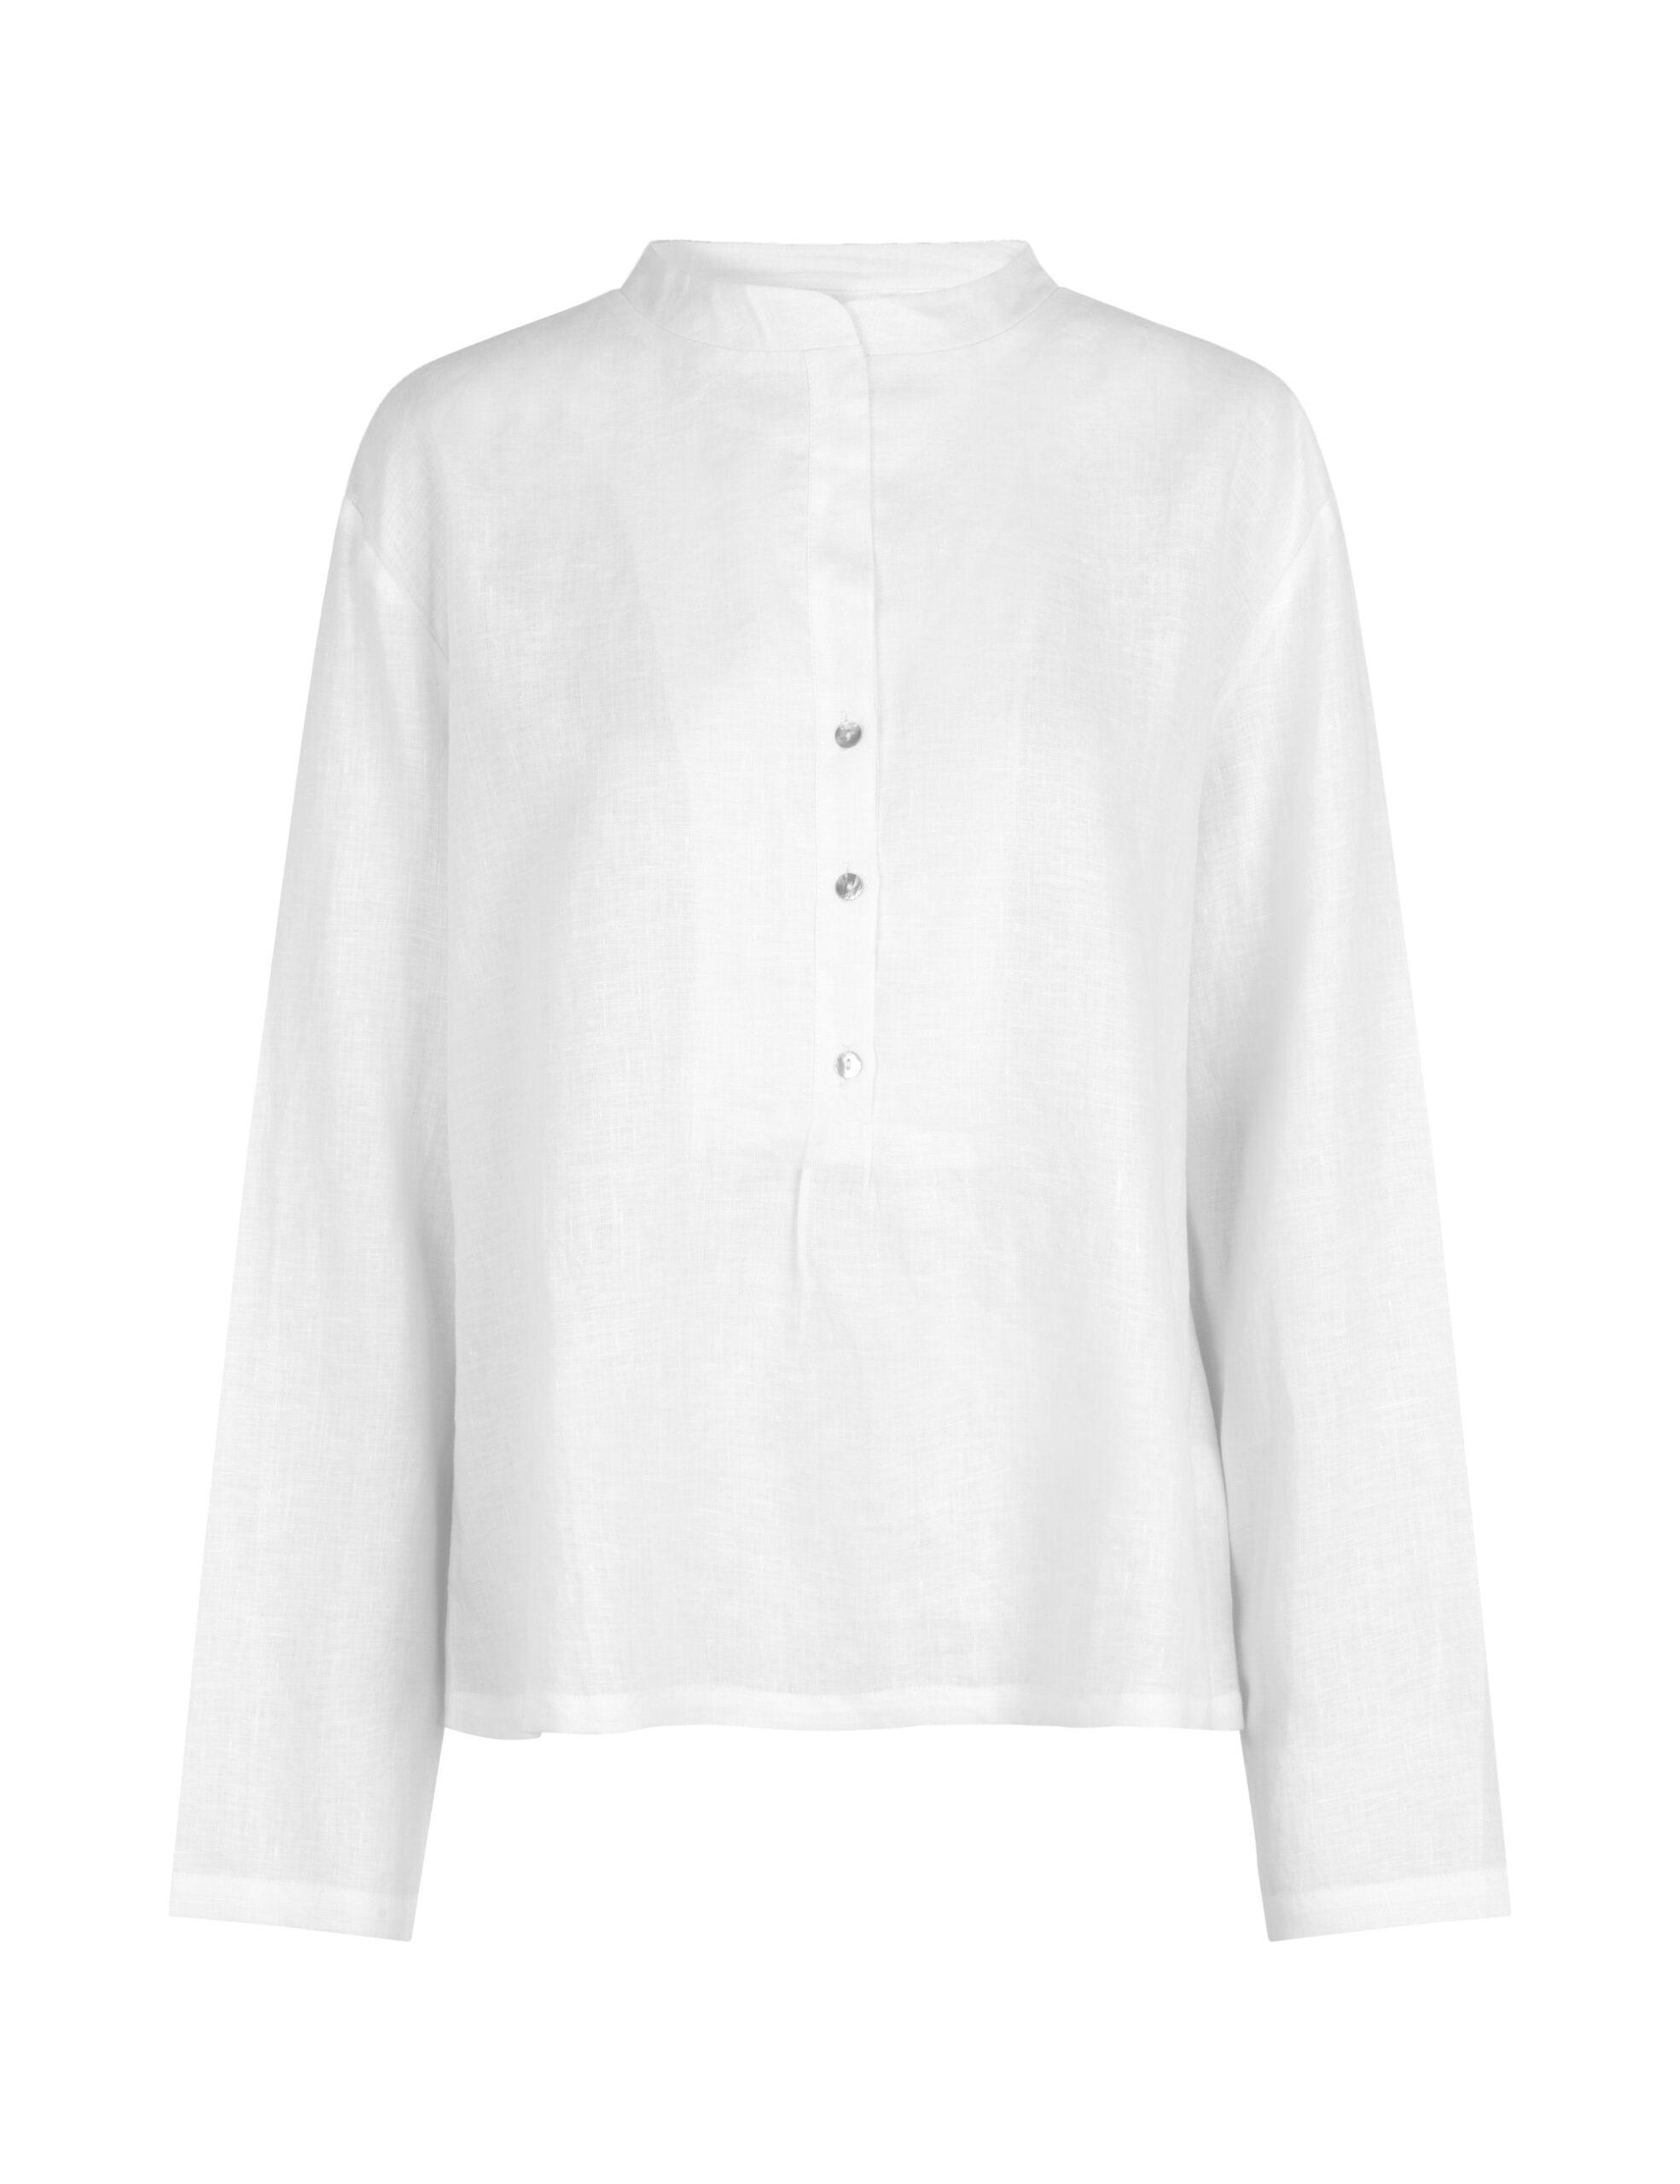 LINDA SHIRT – White